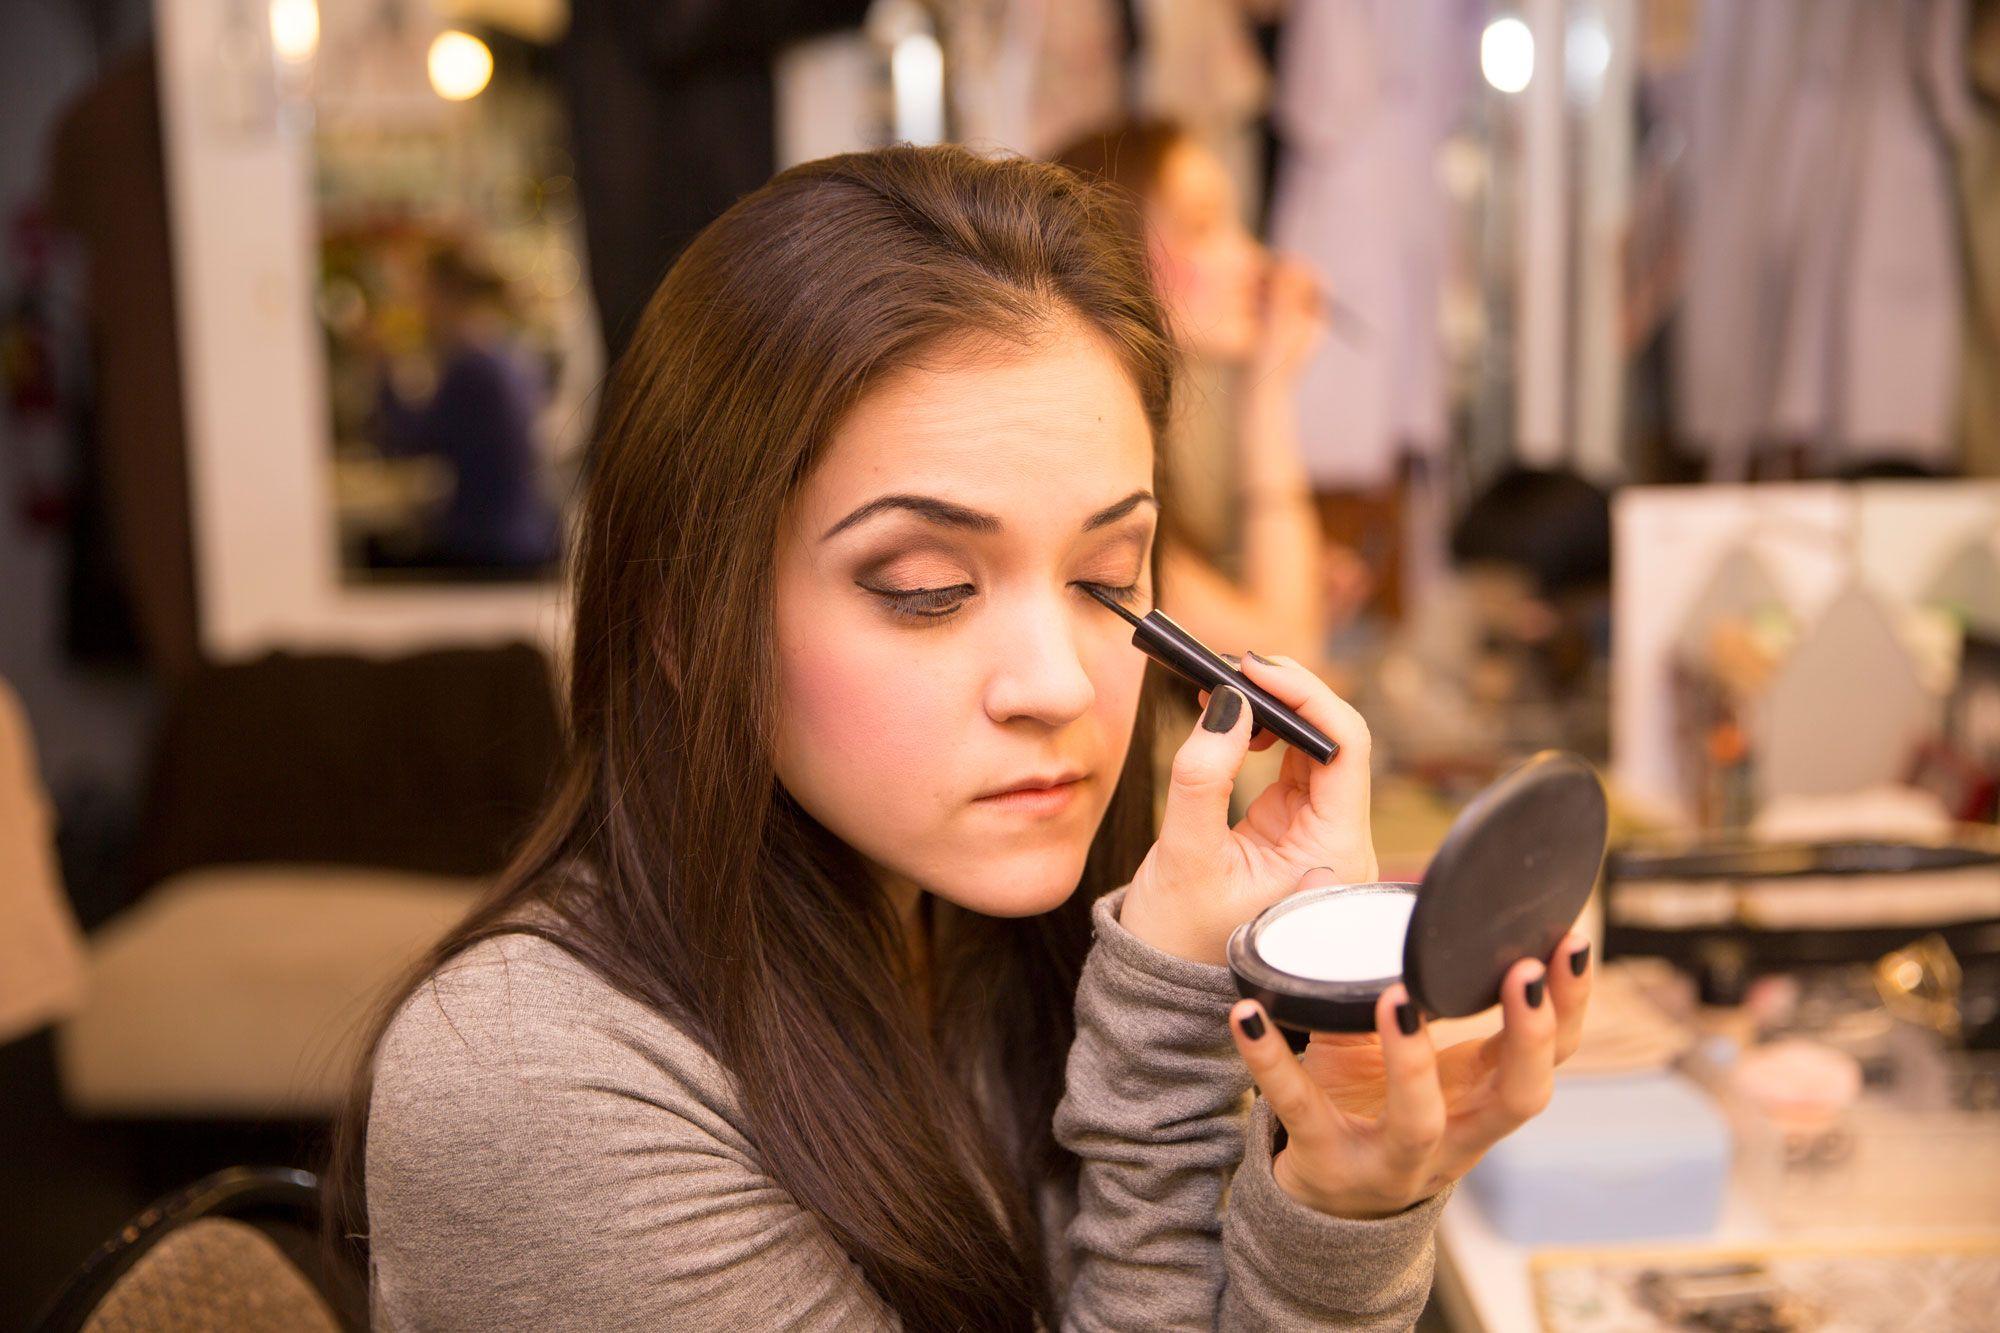 Life Is A Cabaret Cabaret Girls Makeup Cabaret Broadway